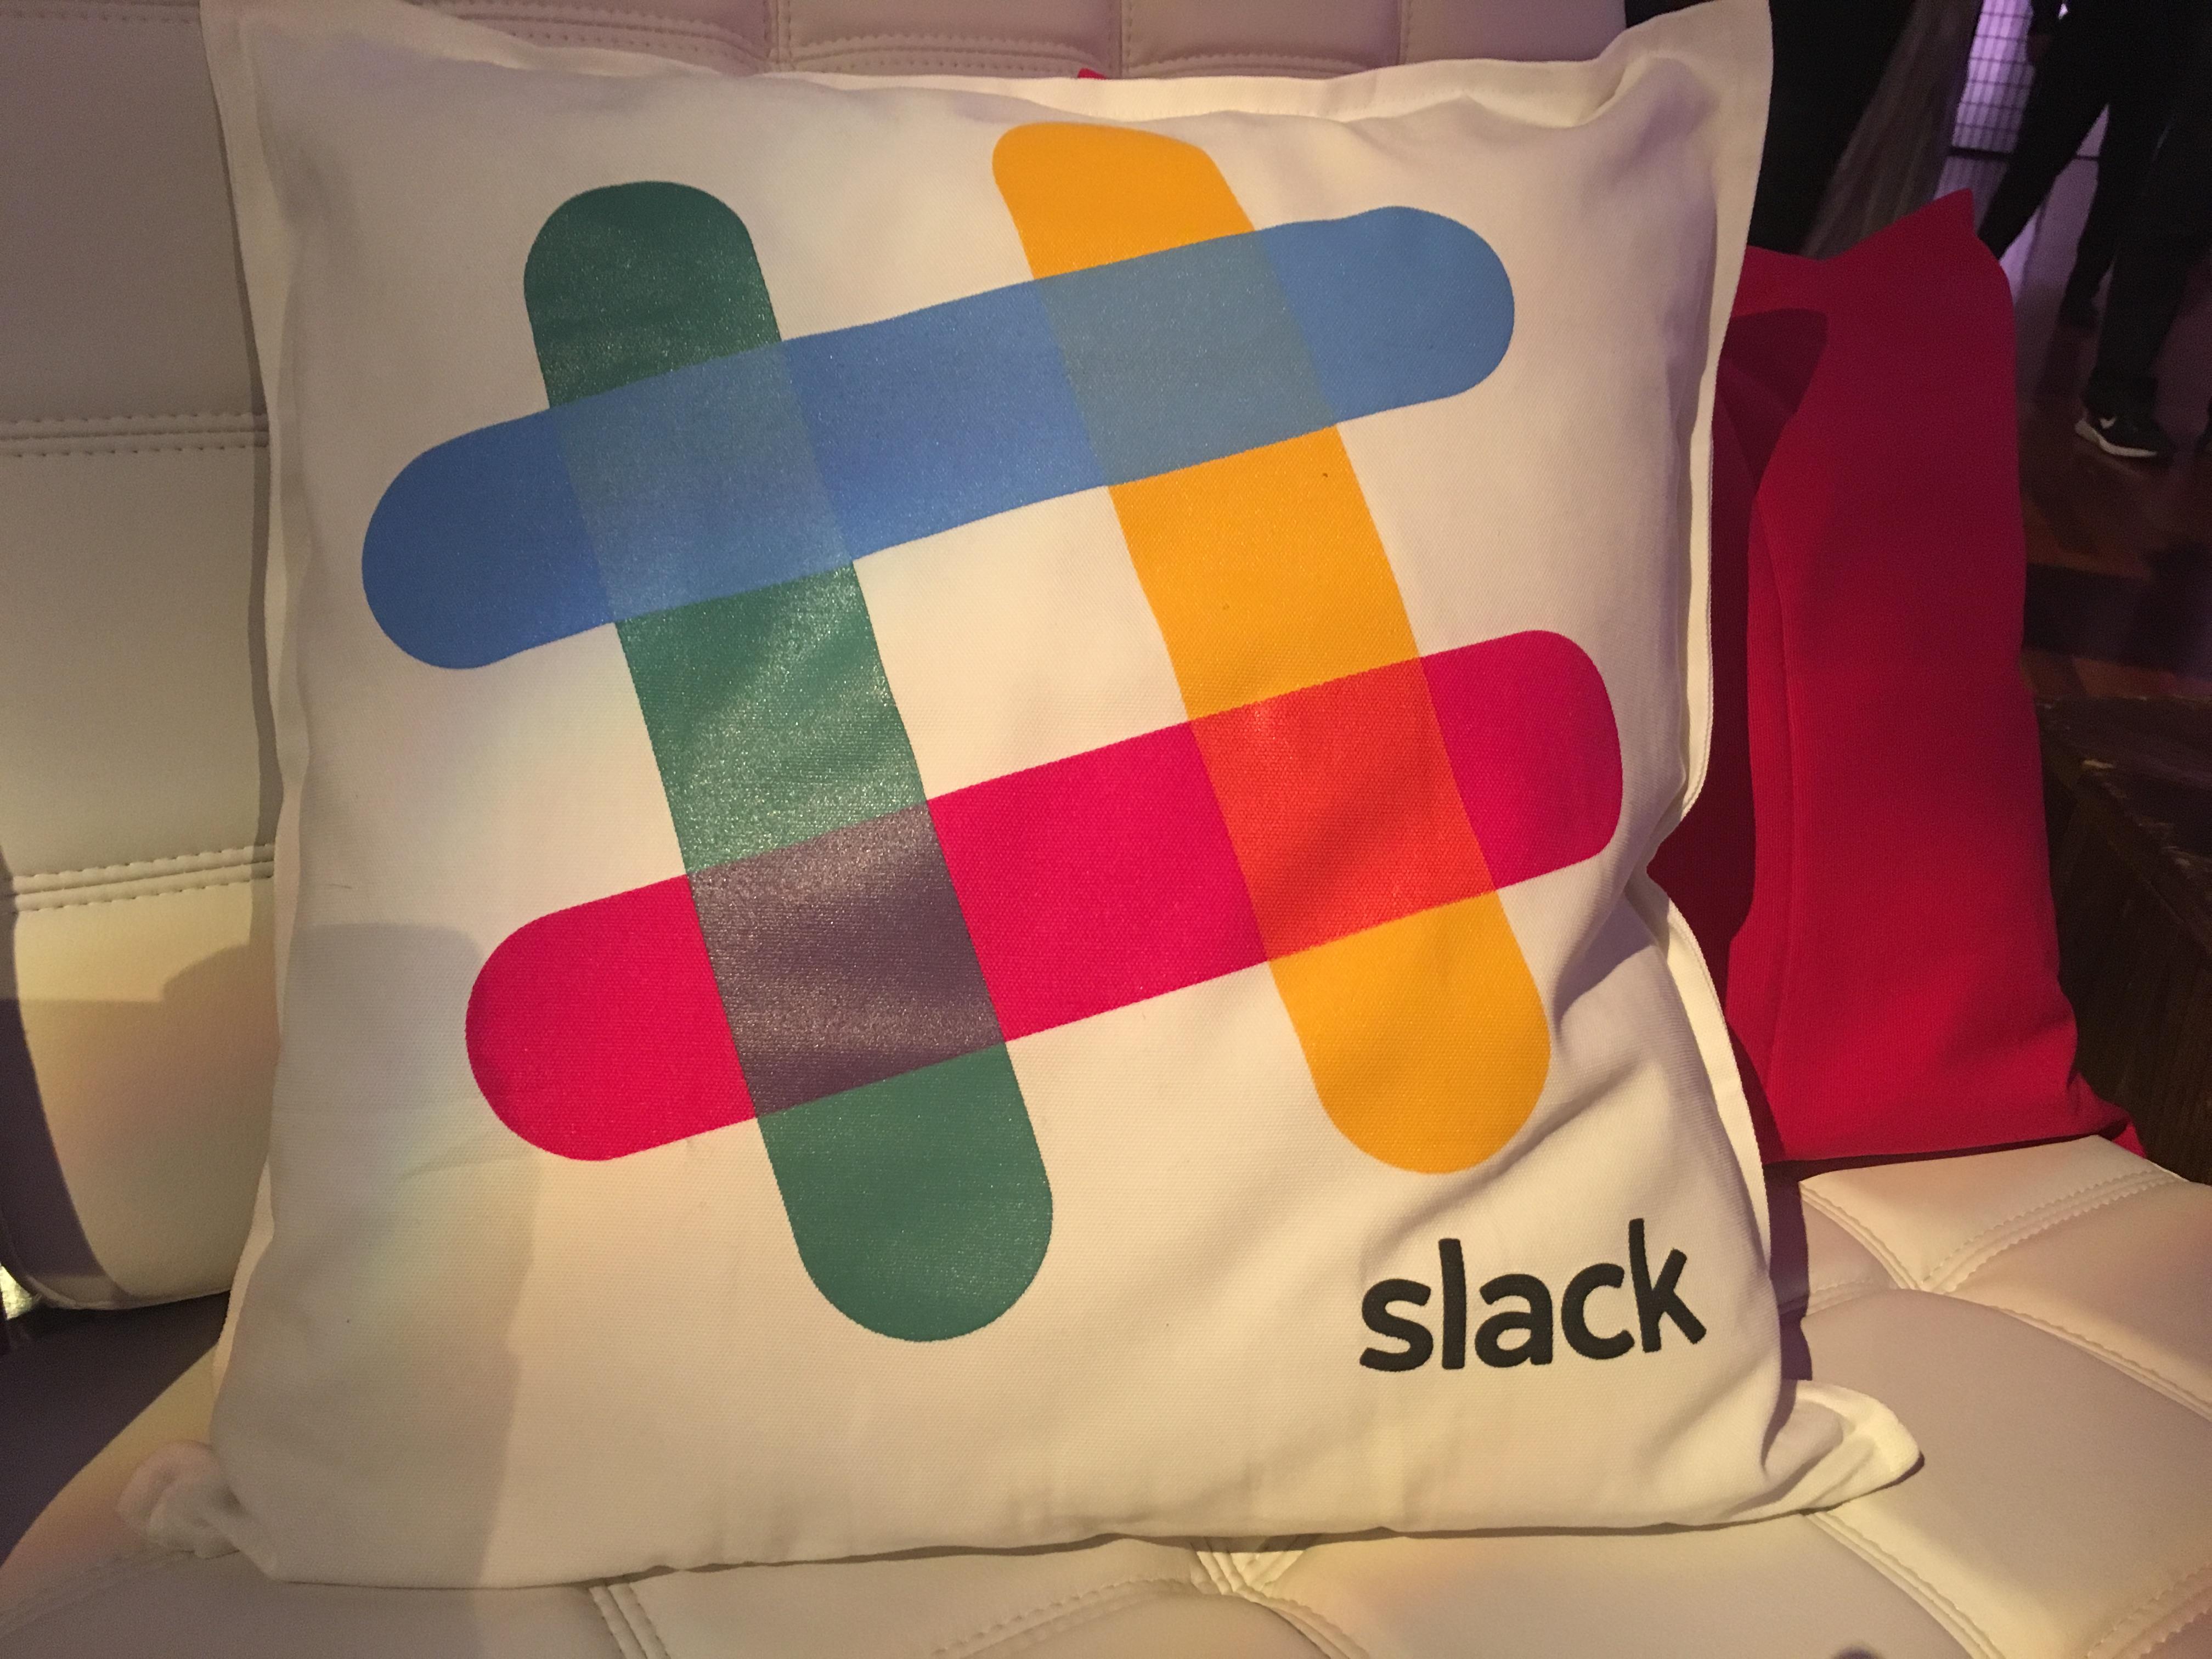 A Slack pillow at a Slack event in San Francisco on December 15.